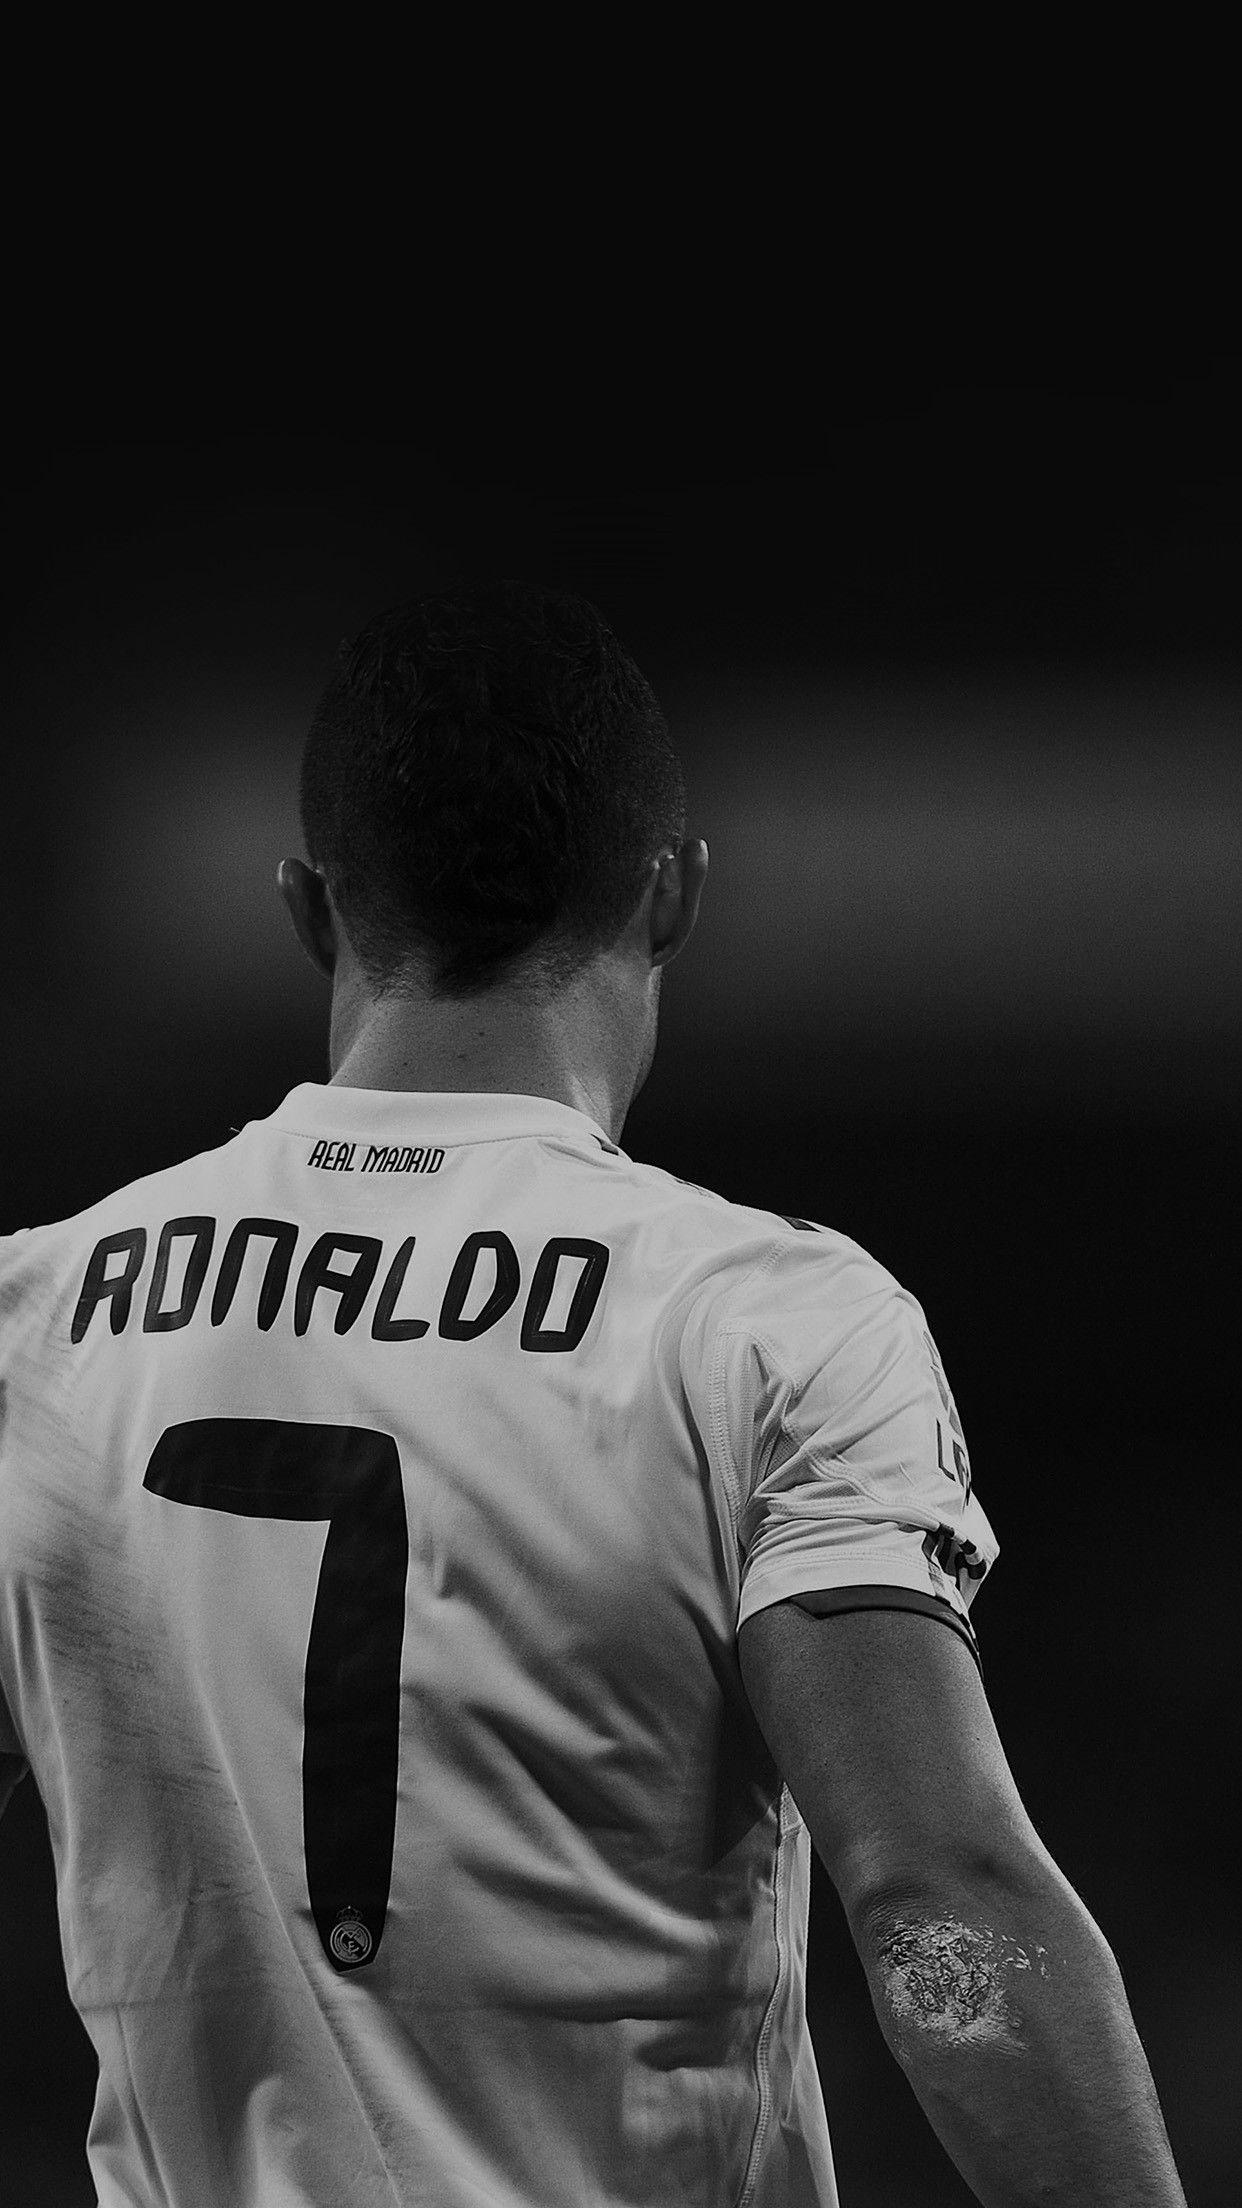 Cristiano Ronaldo 7 Real Madrid Soccer Black And White Star